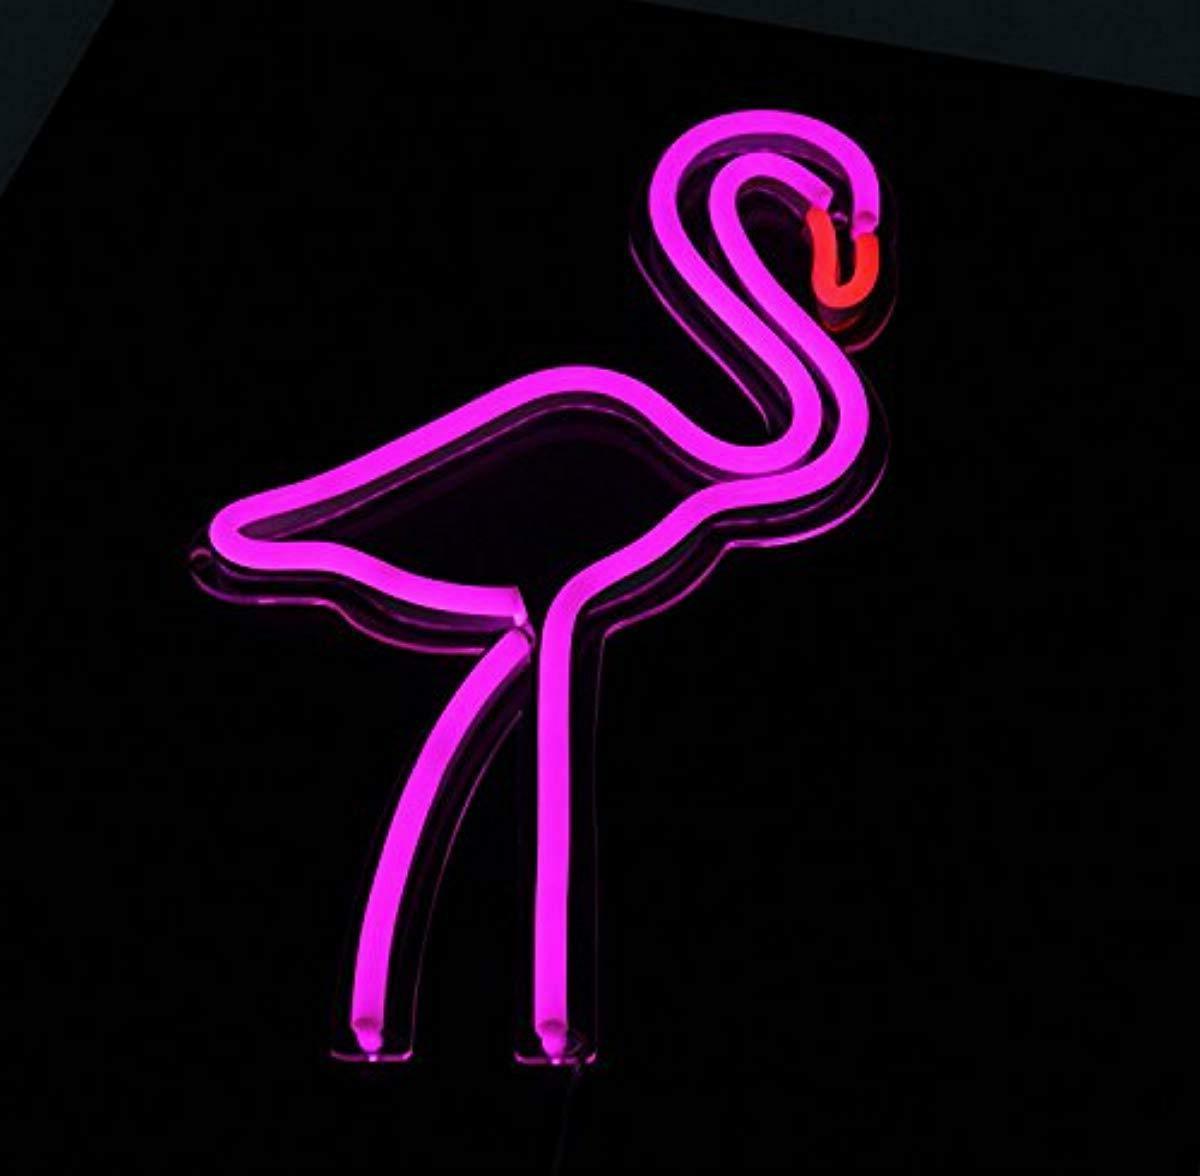 Handmade Ice Signs,Flamingo Neon Sign Co